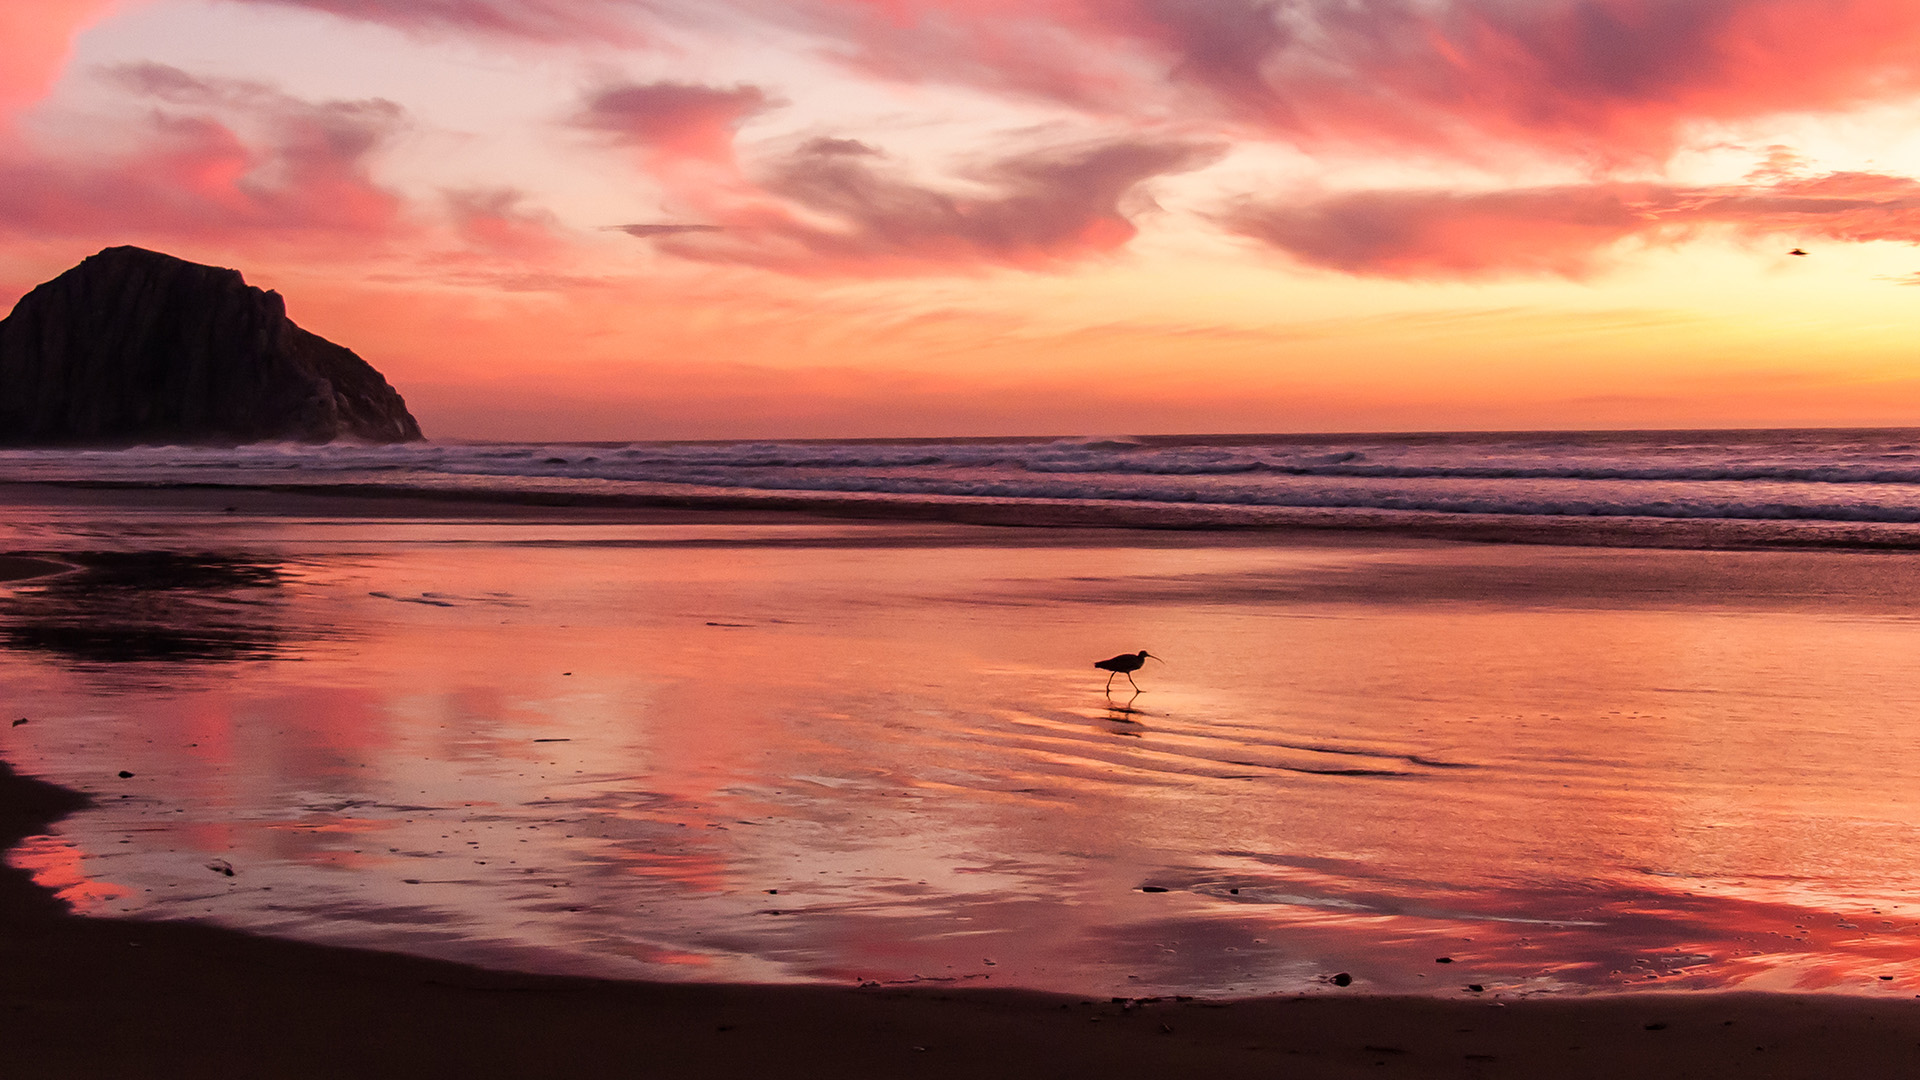 sunset beach nature sea - photo #1